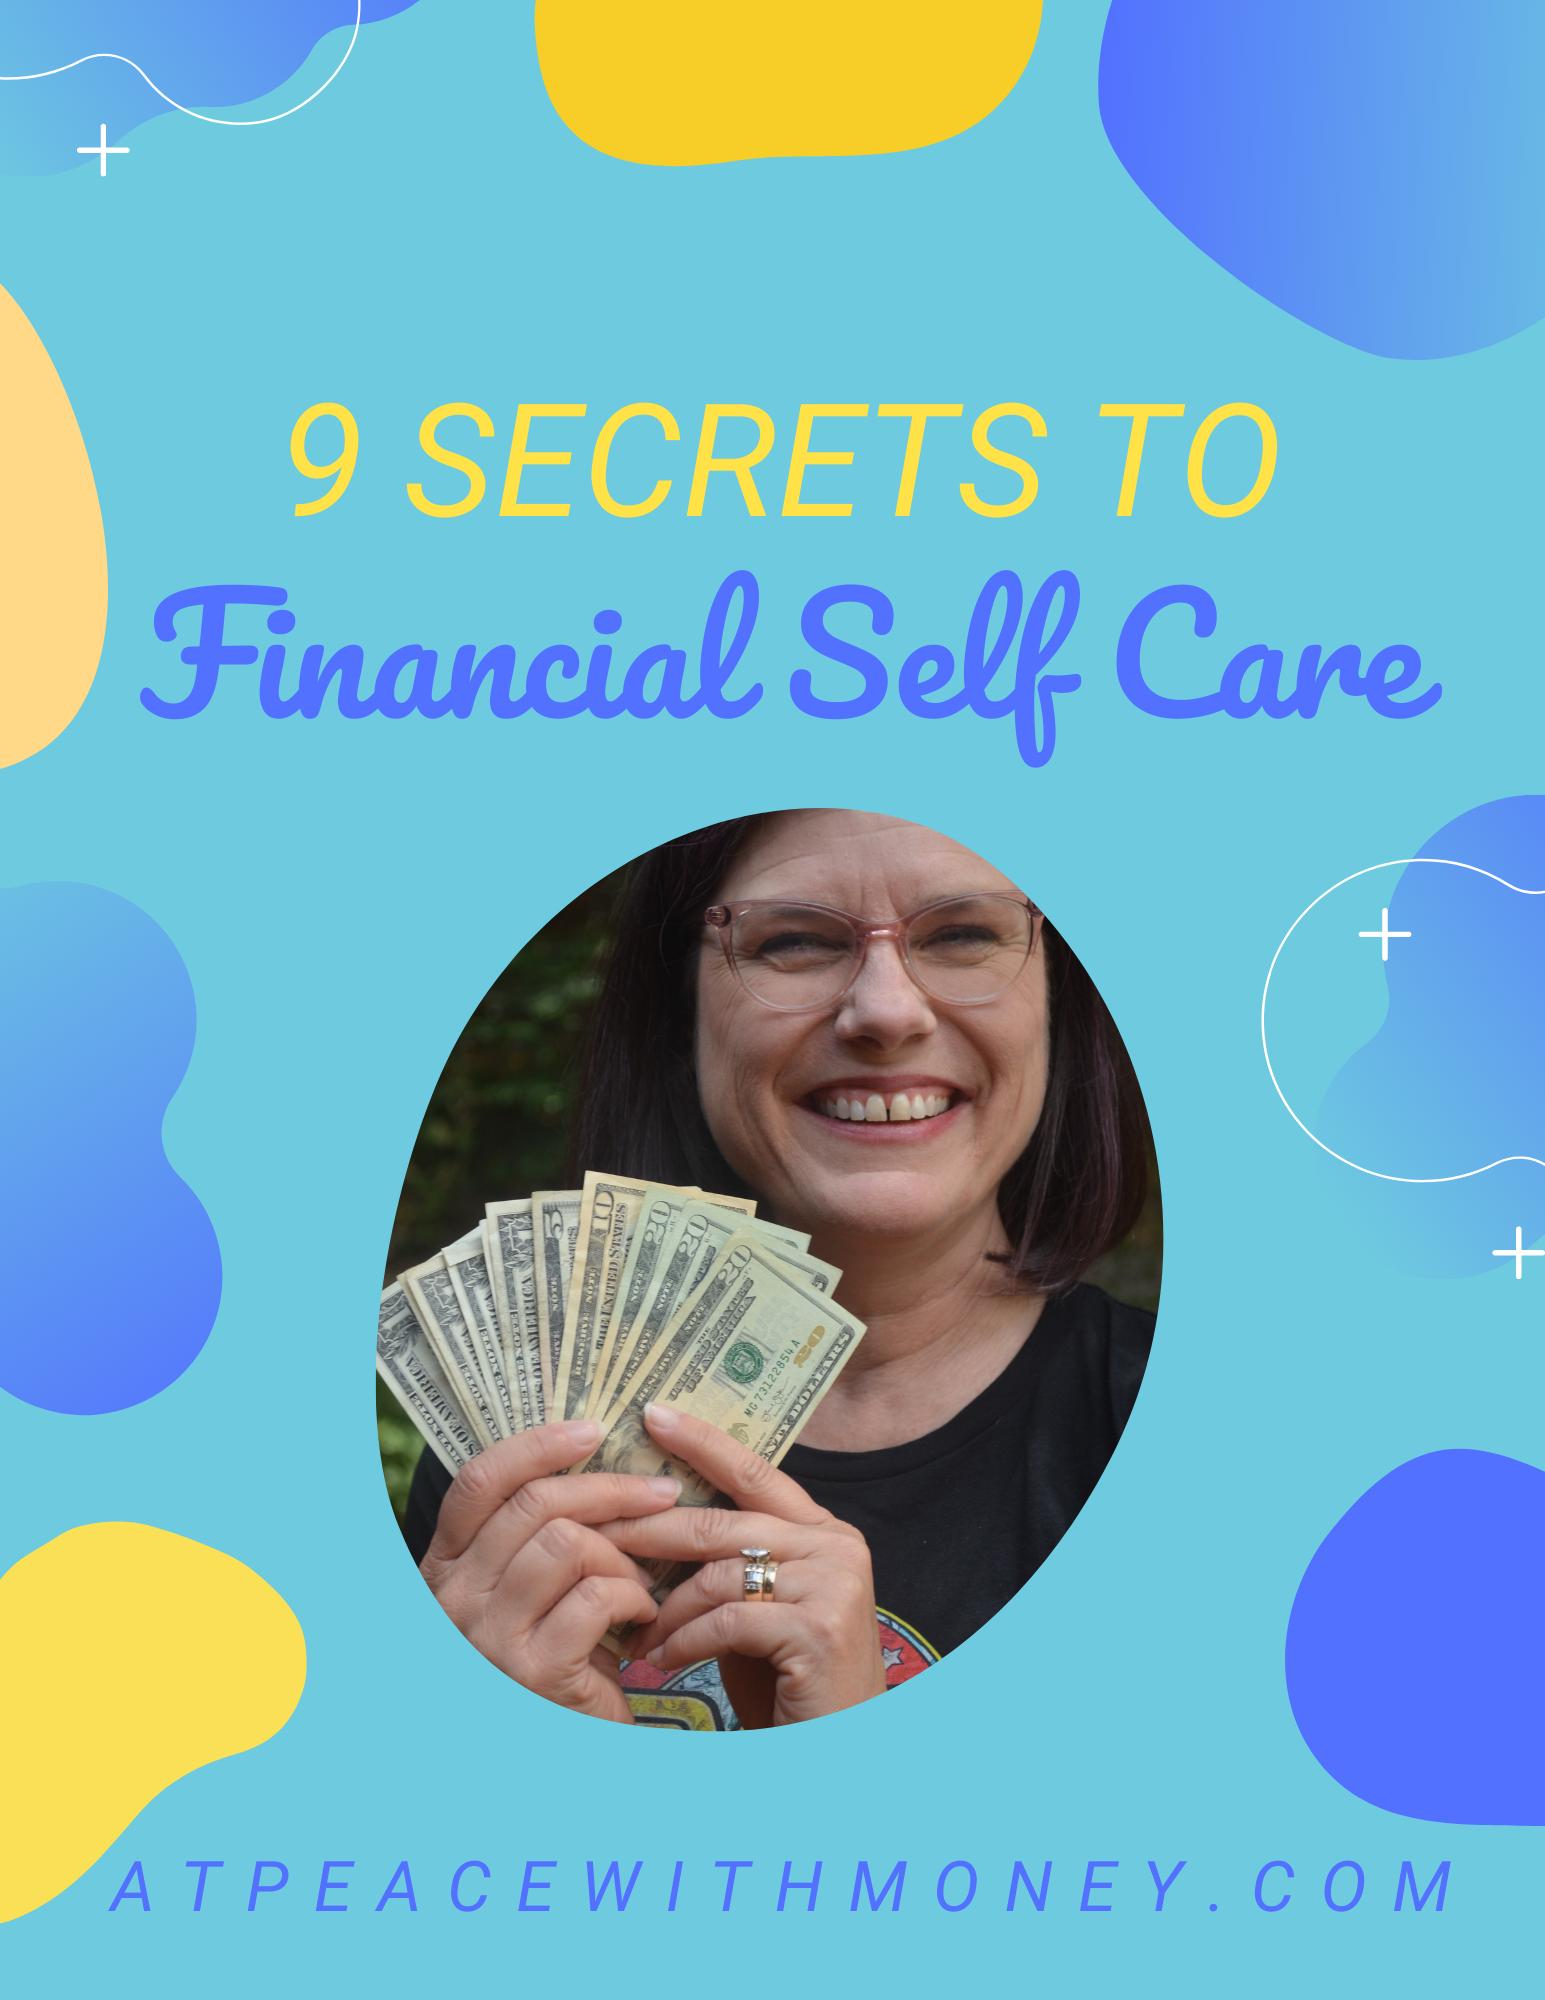 9 Secrets to Financial Self Care